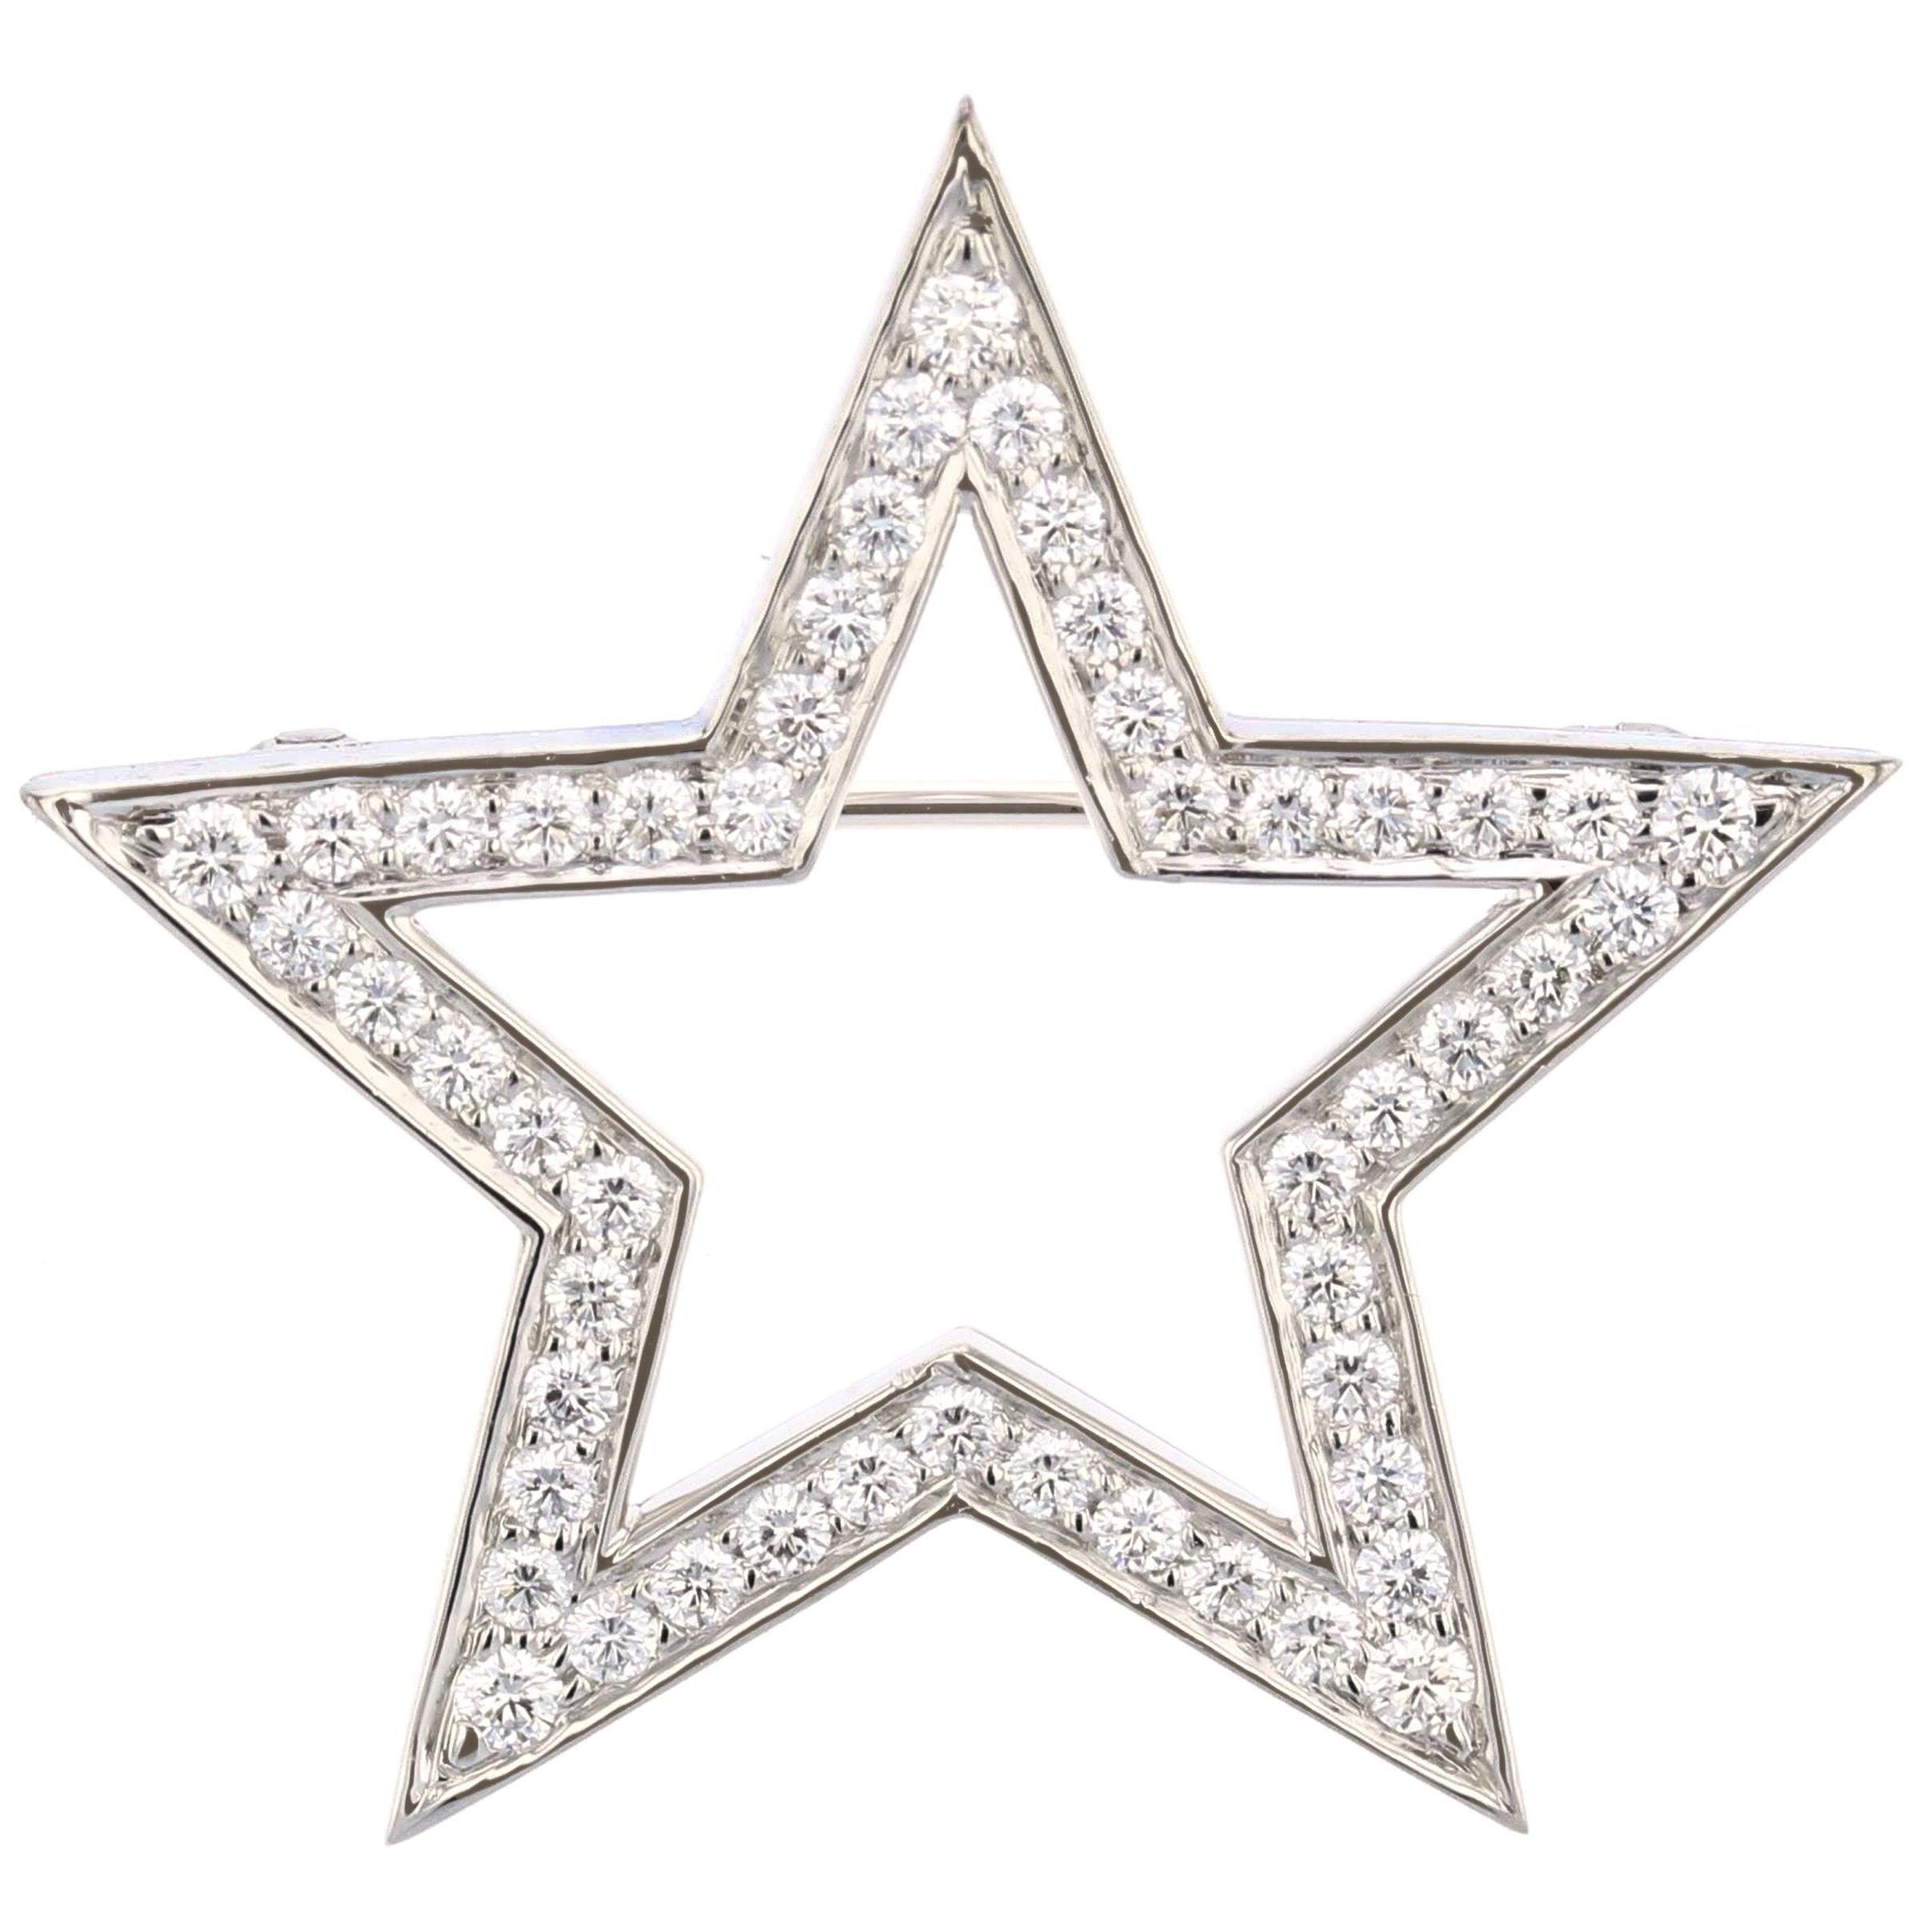 Tiffany & Co. Platinum Diamond Star Brooch